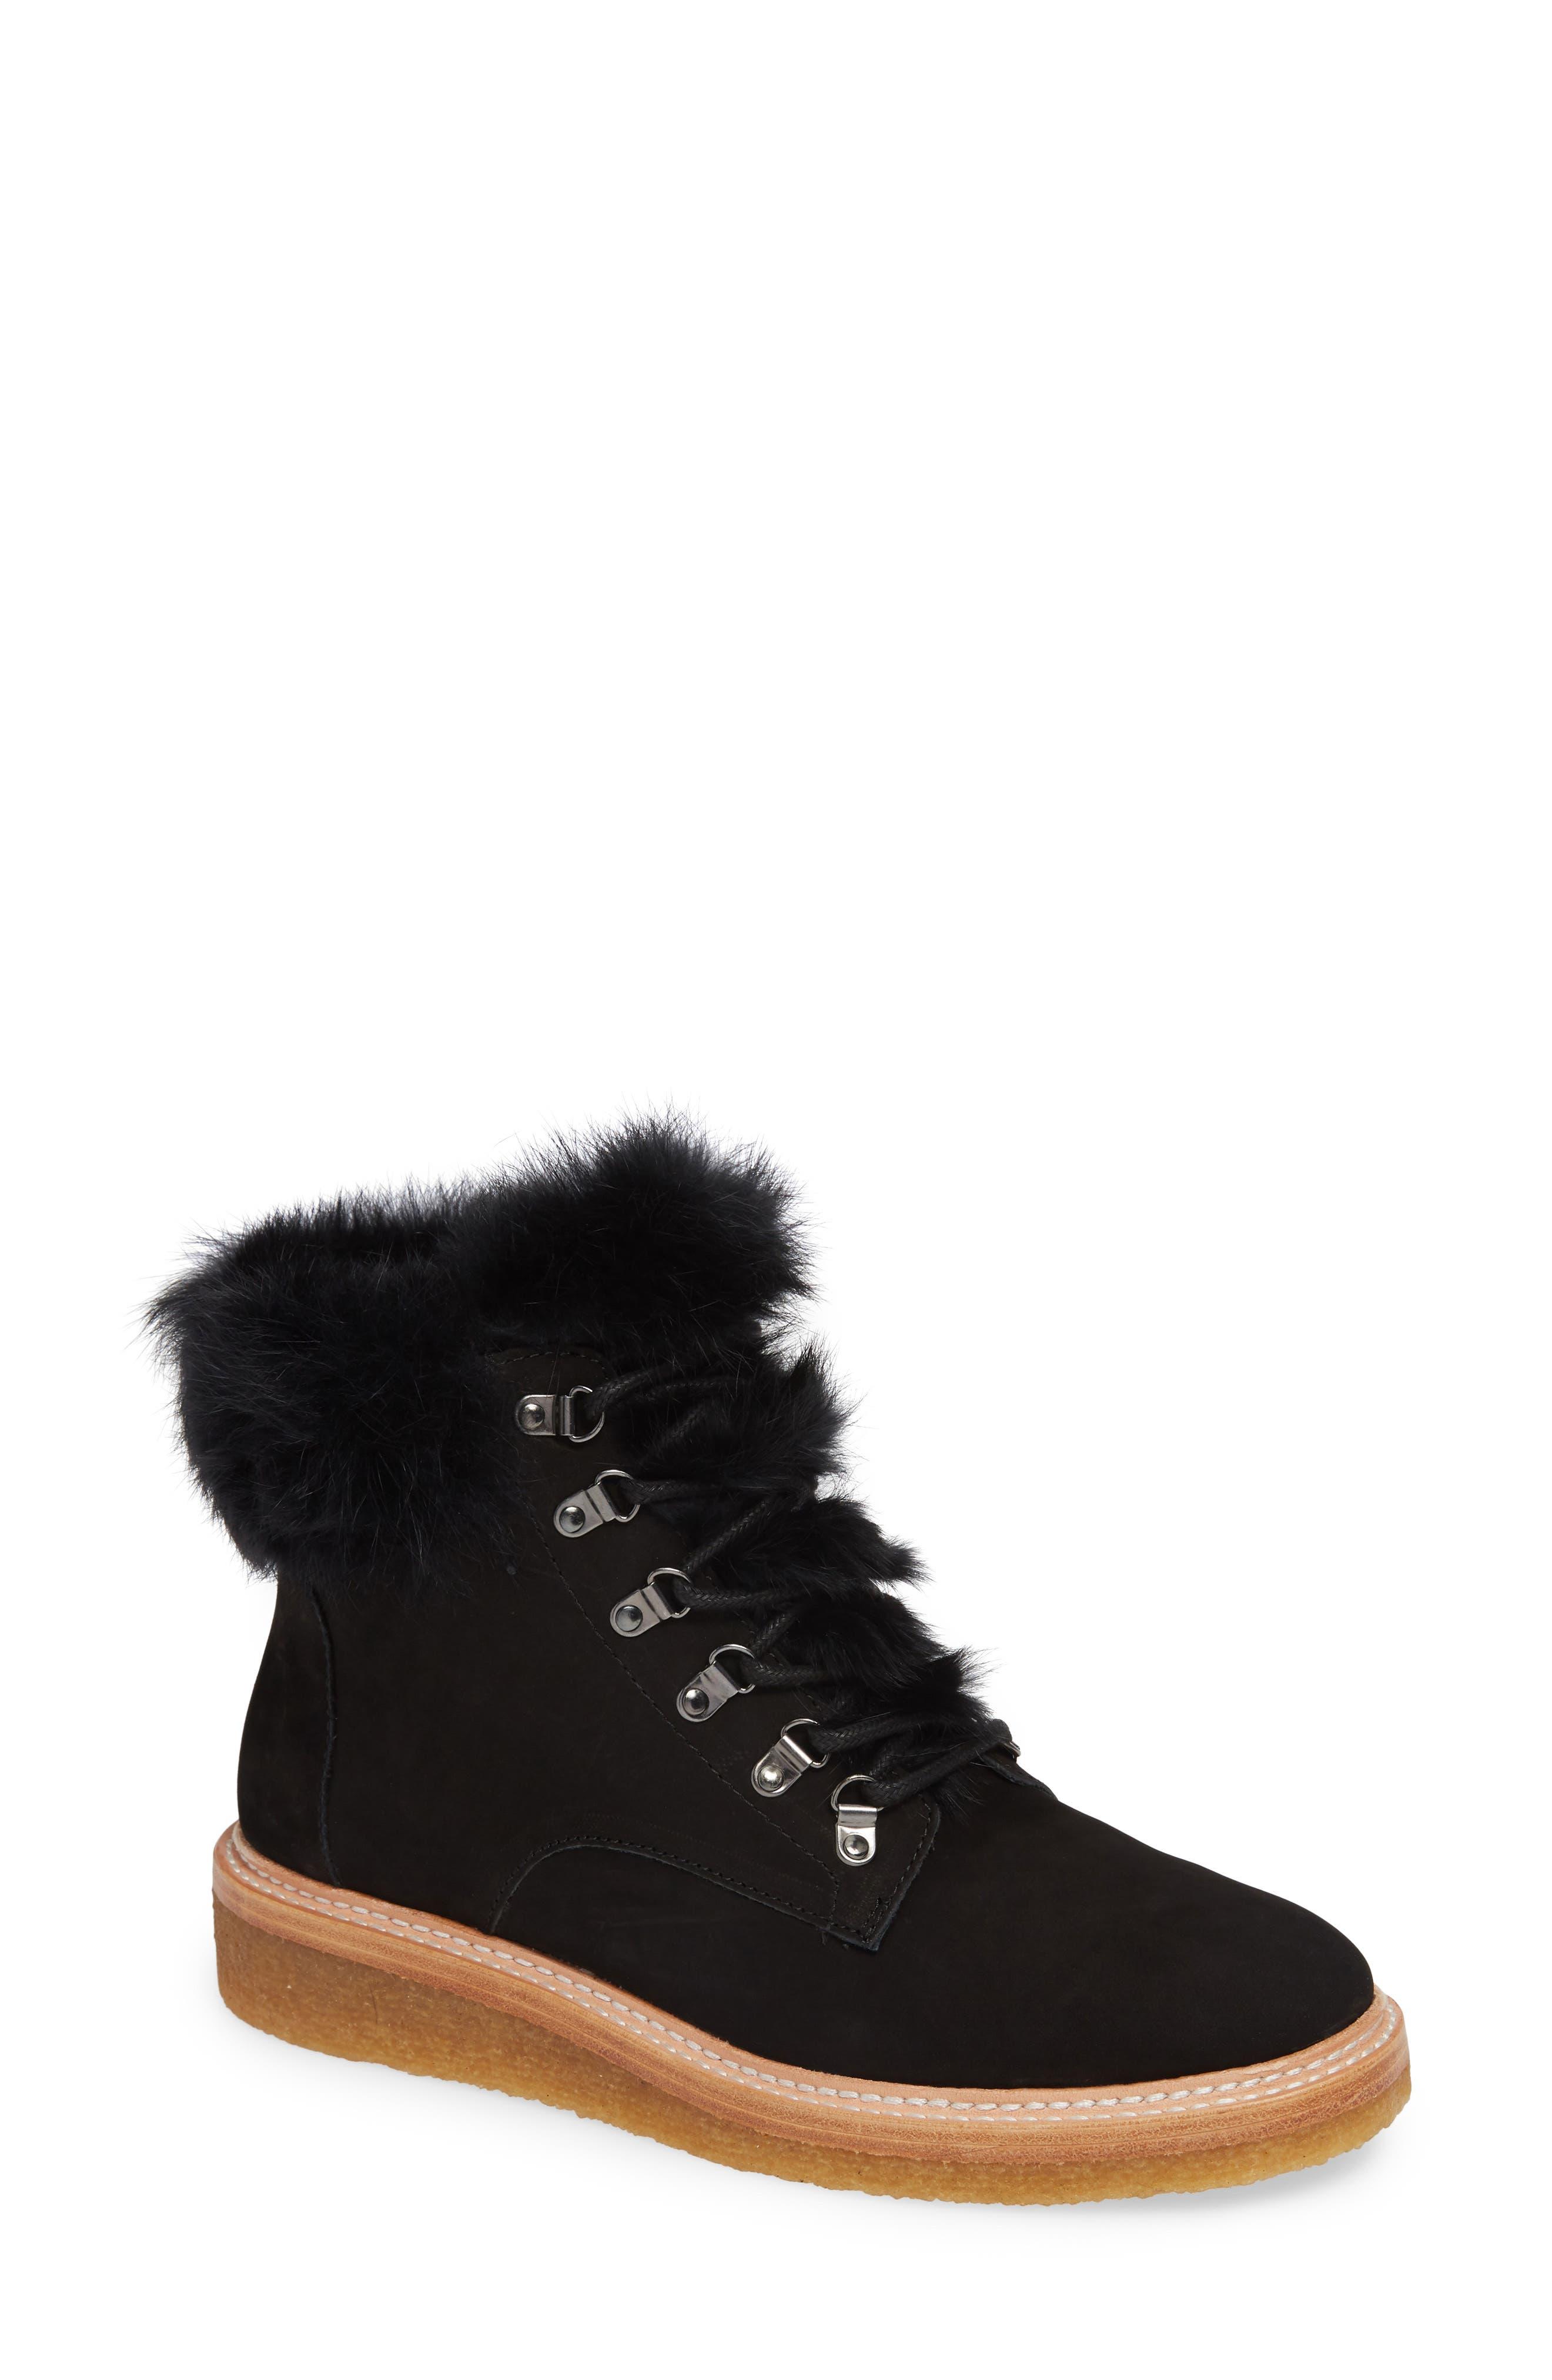 BOTKIER,                             Winter Genuine Rabbit Fur Trim Boot,                             Main thumbnail 1, color,                             BLACK SUEDE